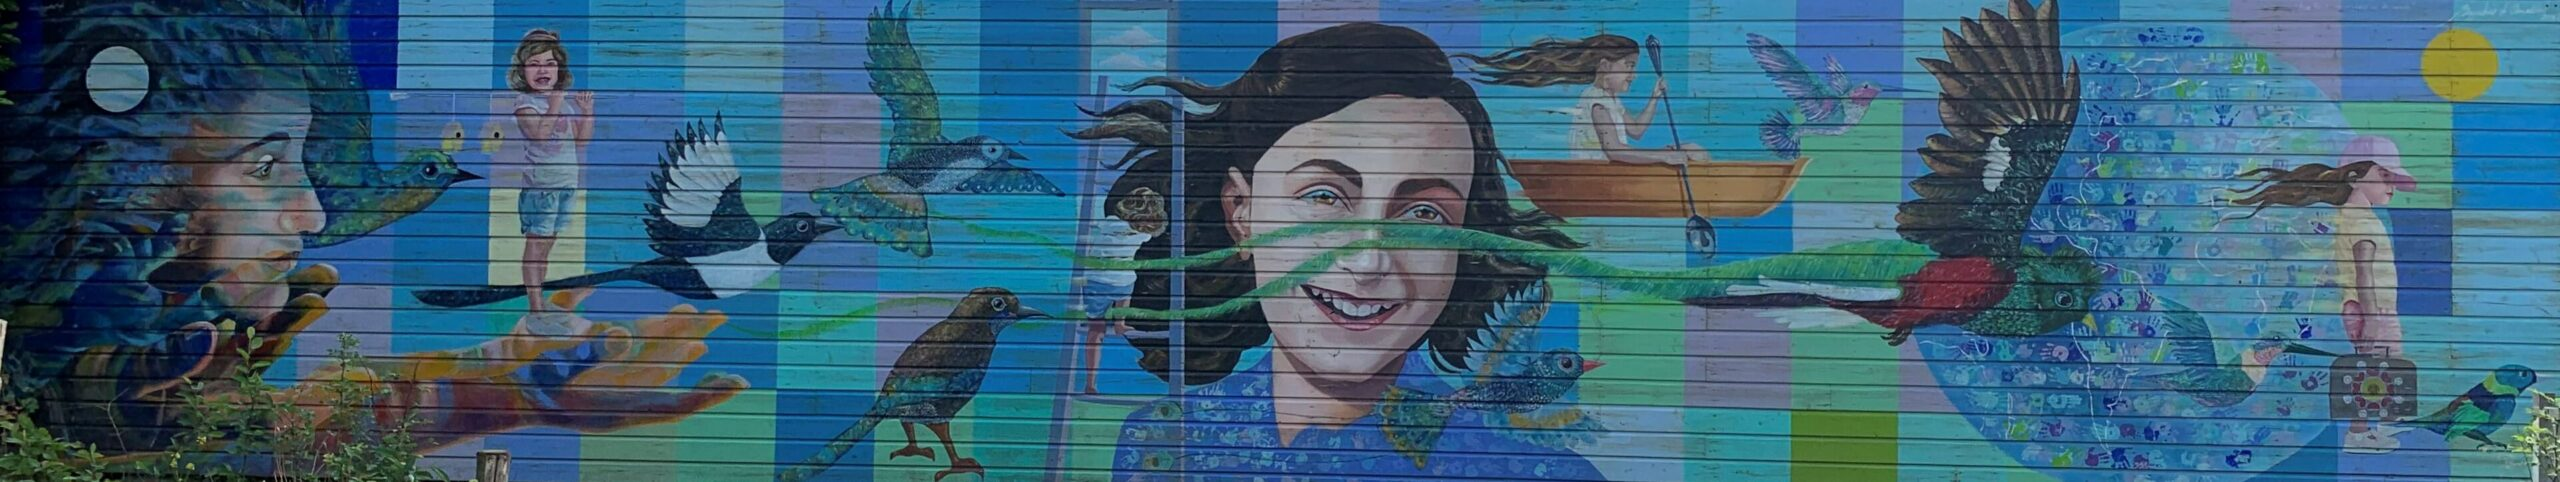 Mural de Ana Frank en Ámsterdam